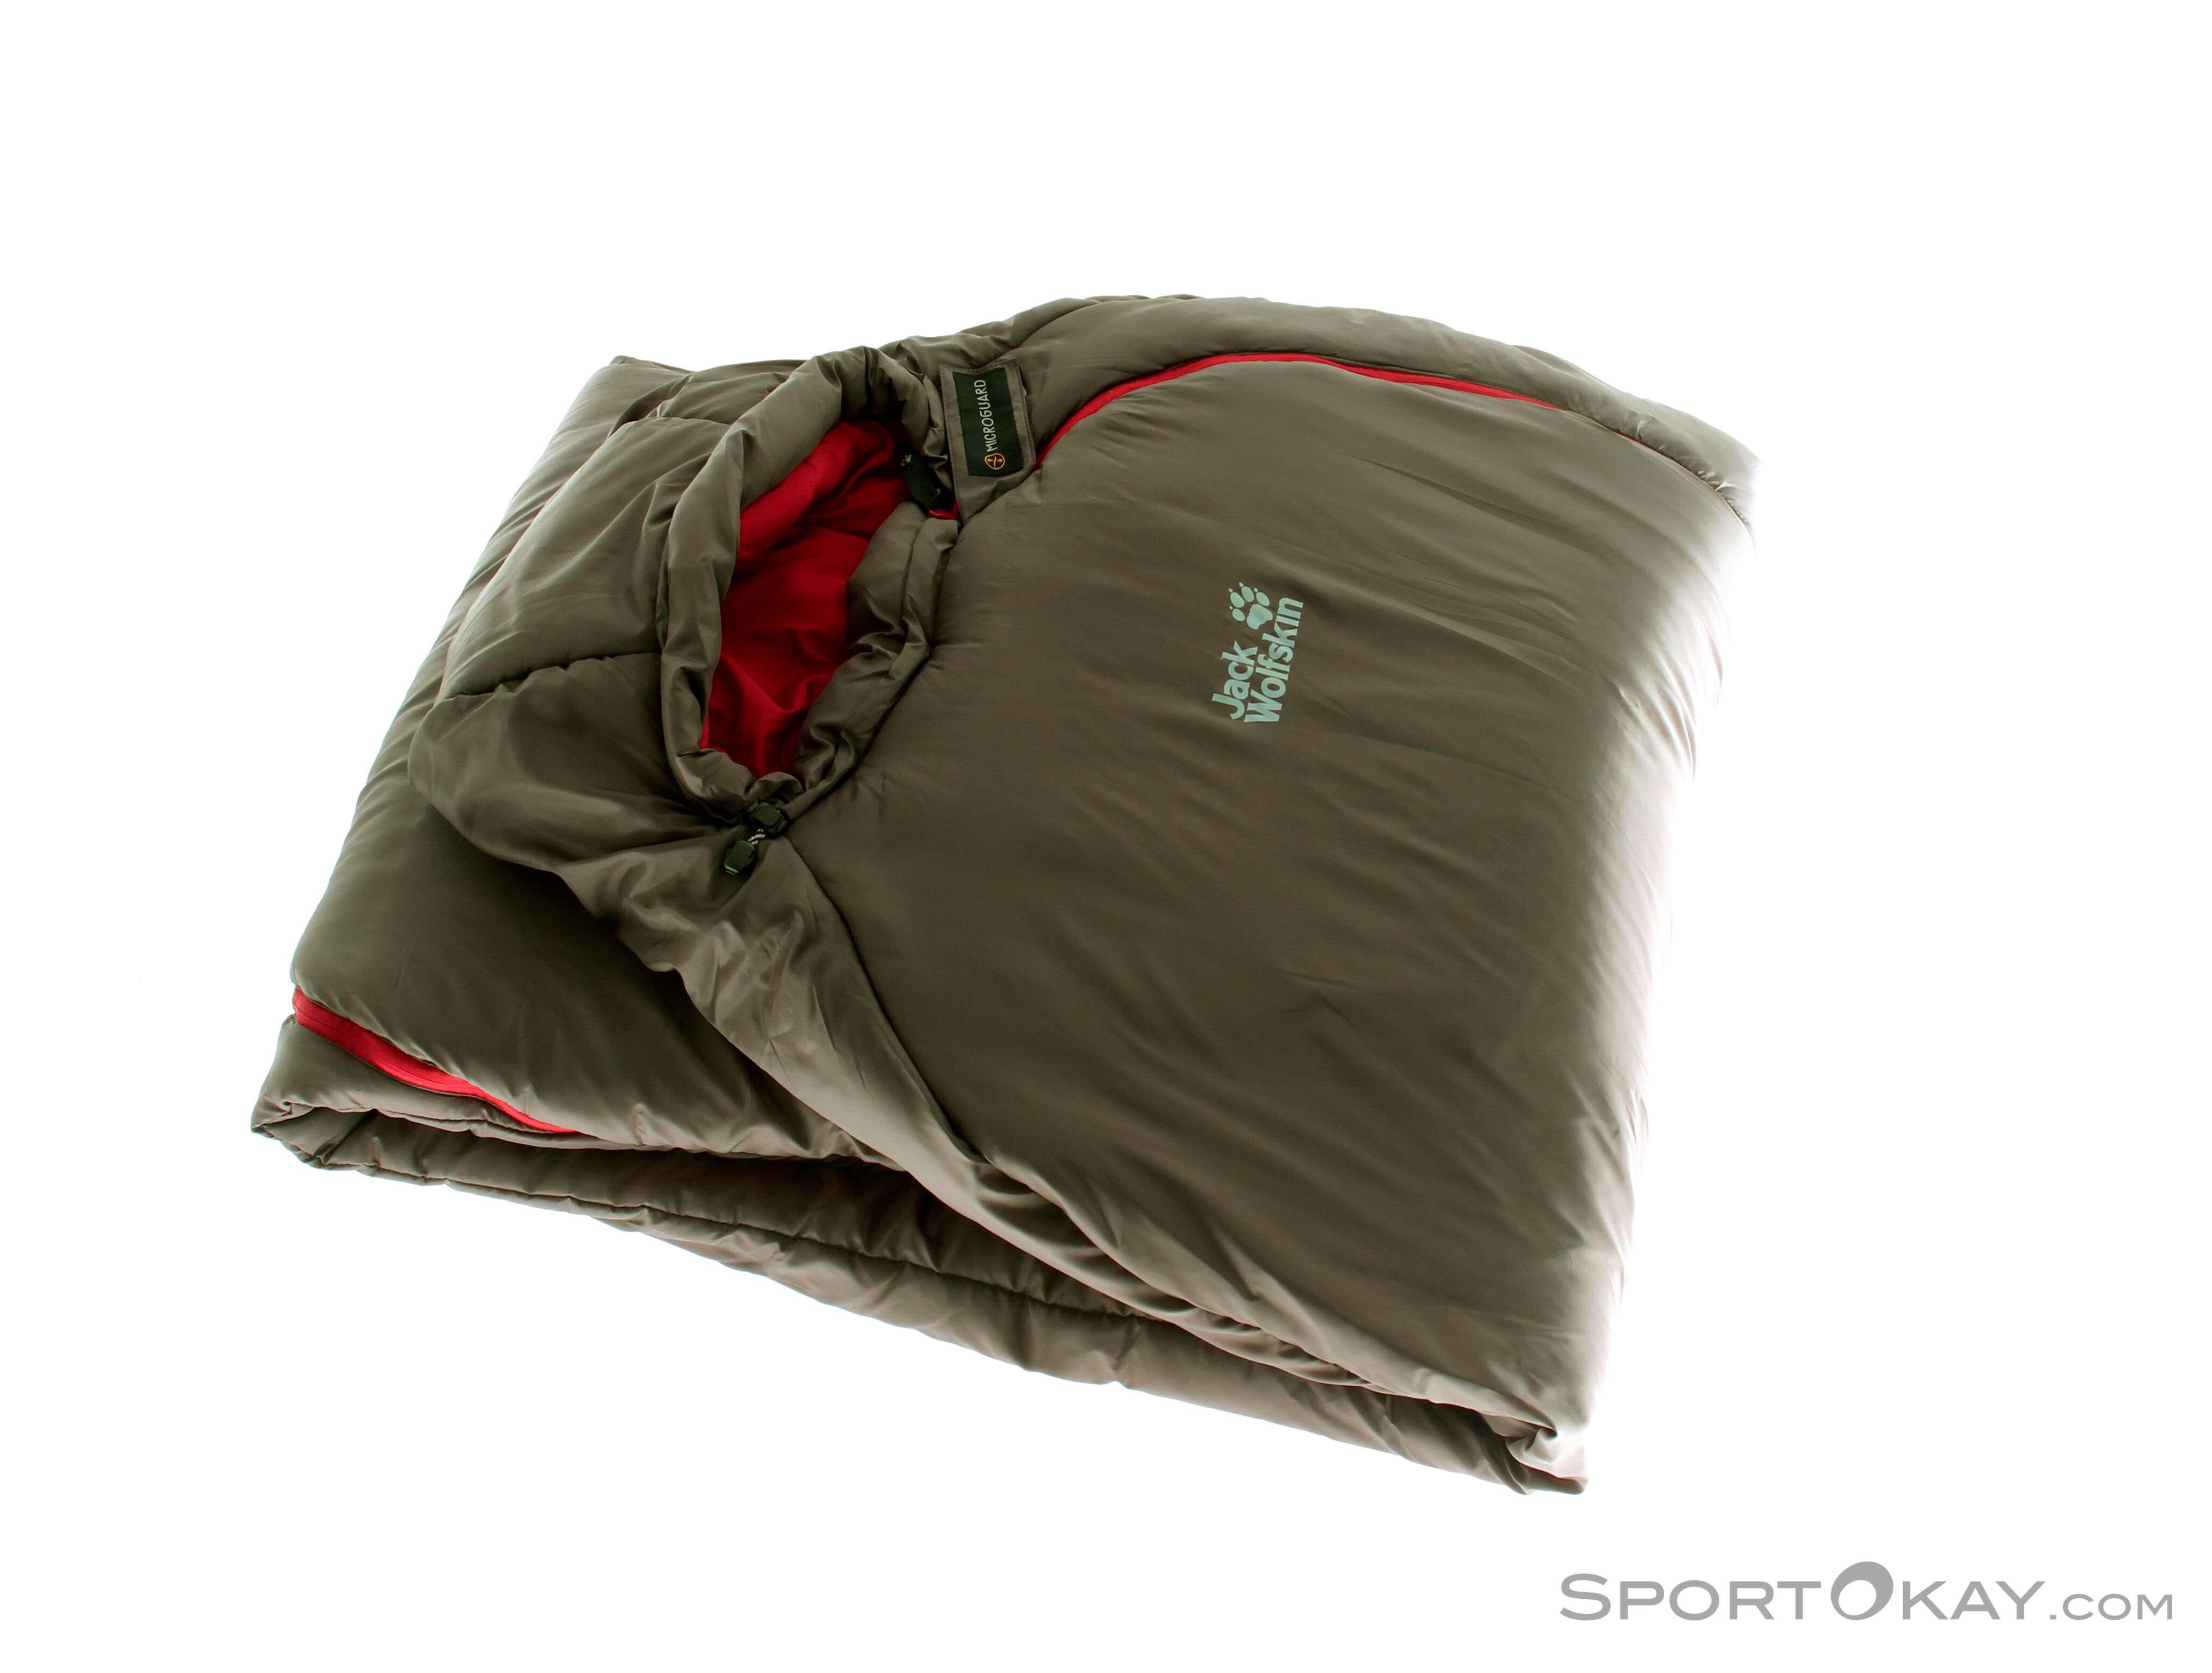 54009909fd8 Jack Wolfskin Smoozip 7 Womens Sleeping Bag, Jack Wolfskin, Brown, , Female,